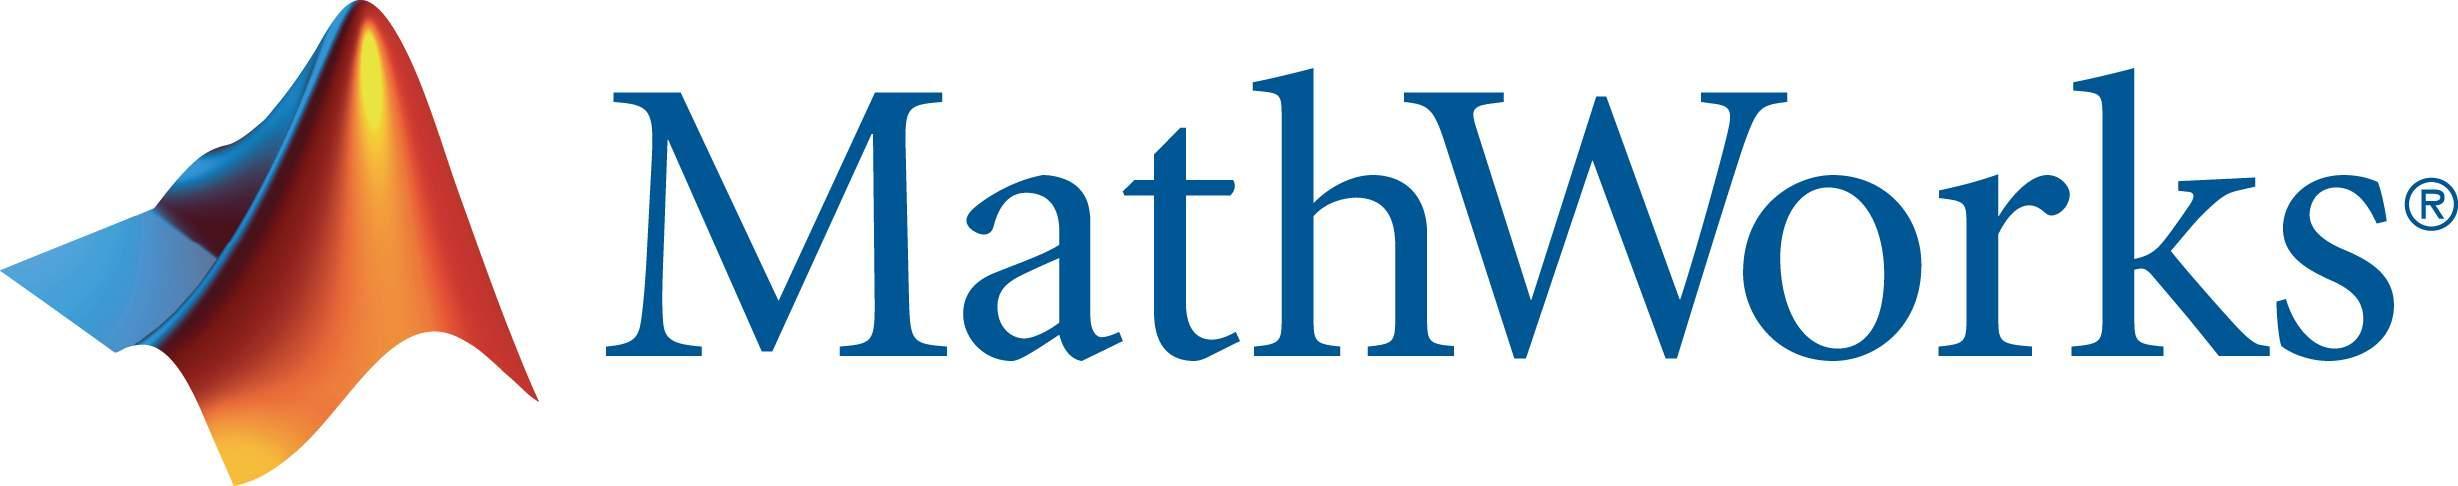 MathWorks Srl